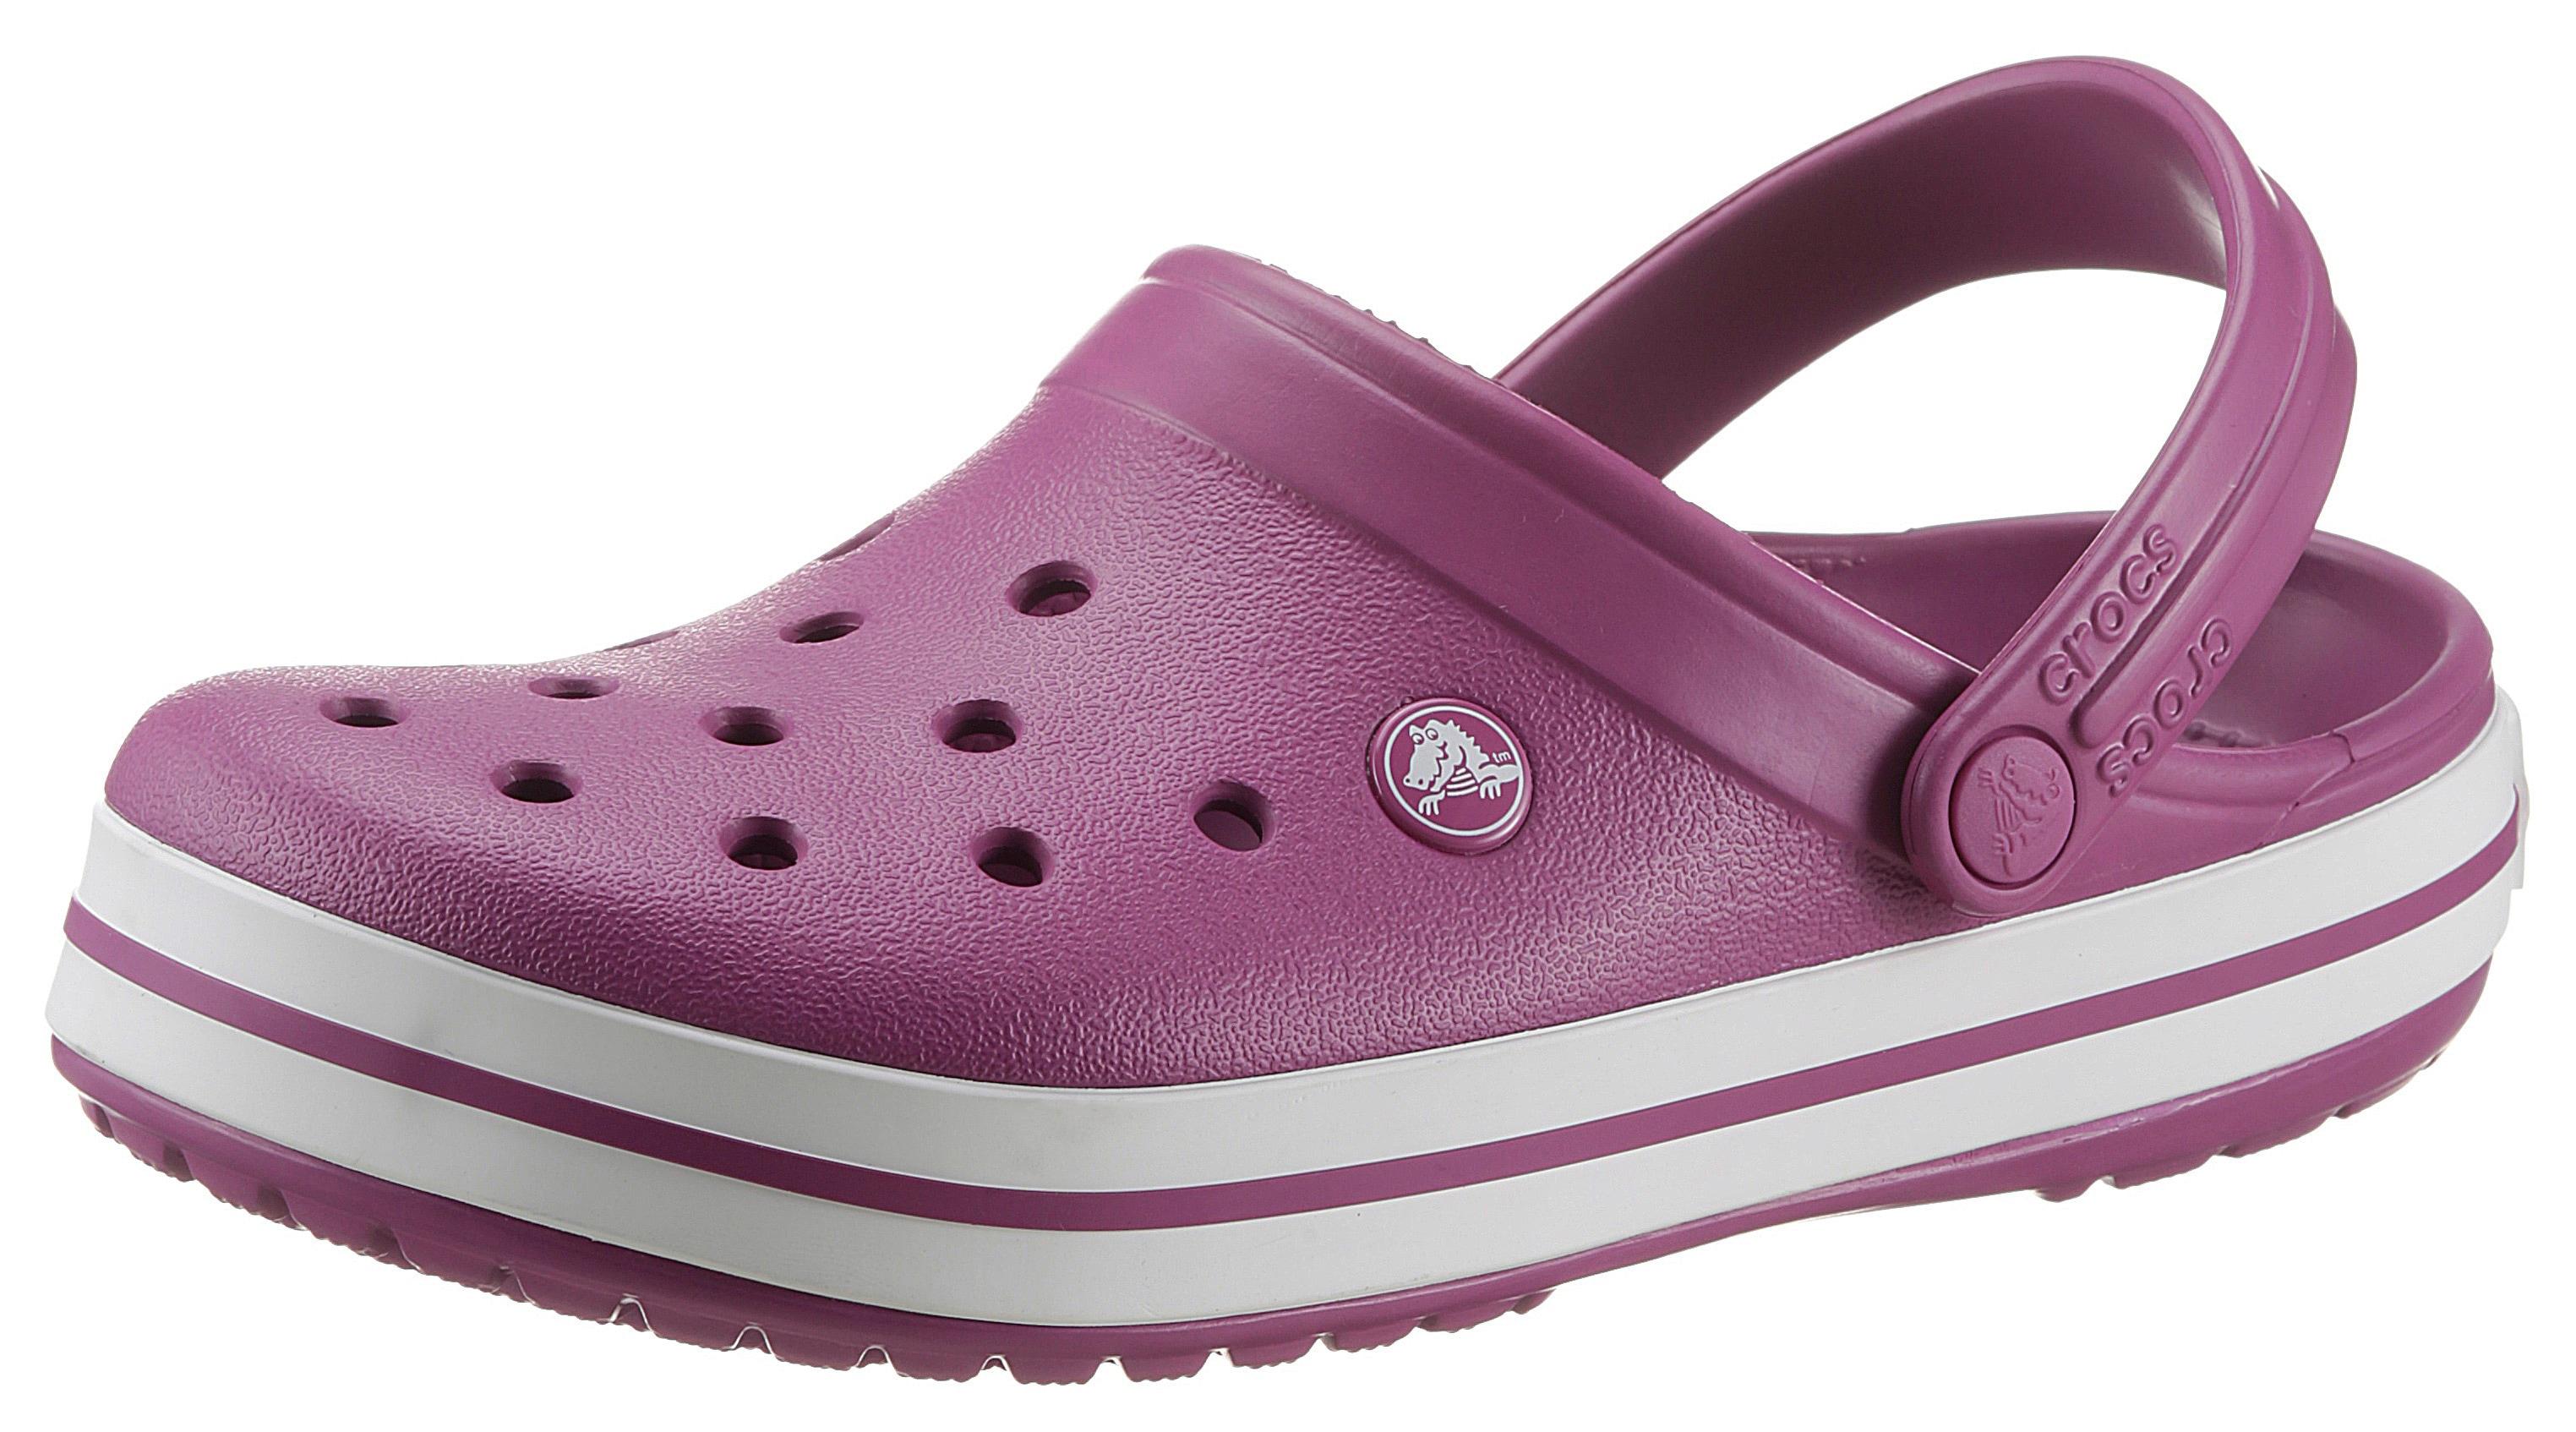 crocs -  Clog Crocband Clog, mit zweifarbiger Laufsohle